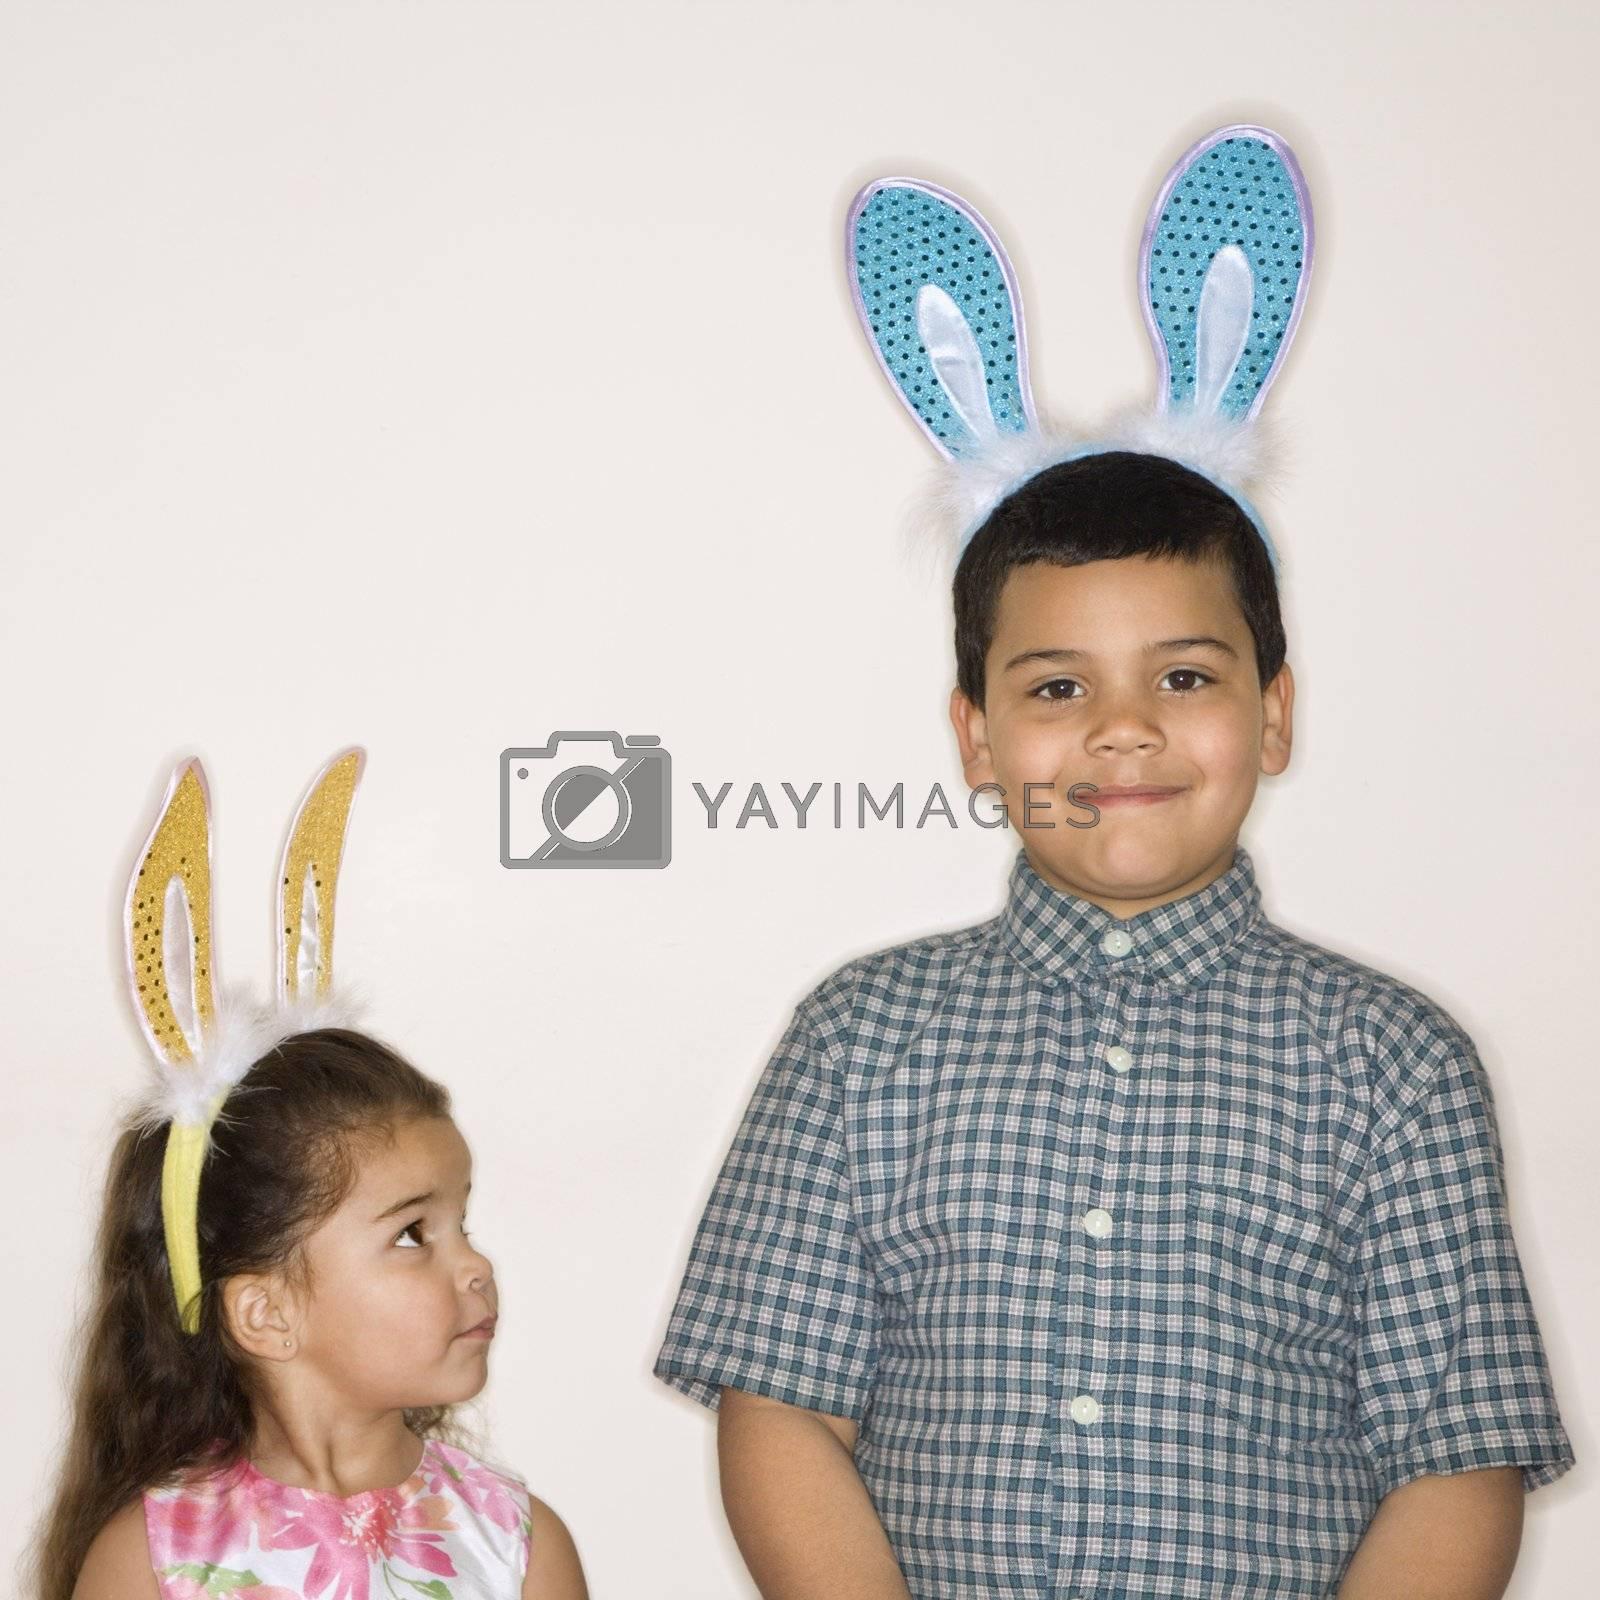 Hispanic girl looking up at Hispanic boy both wearing bunny ears.